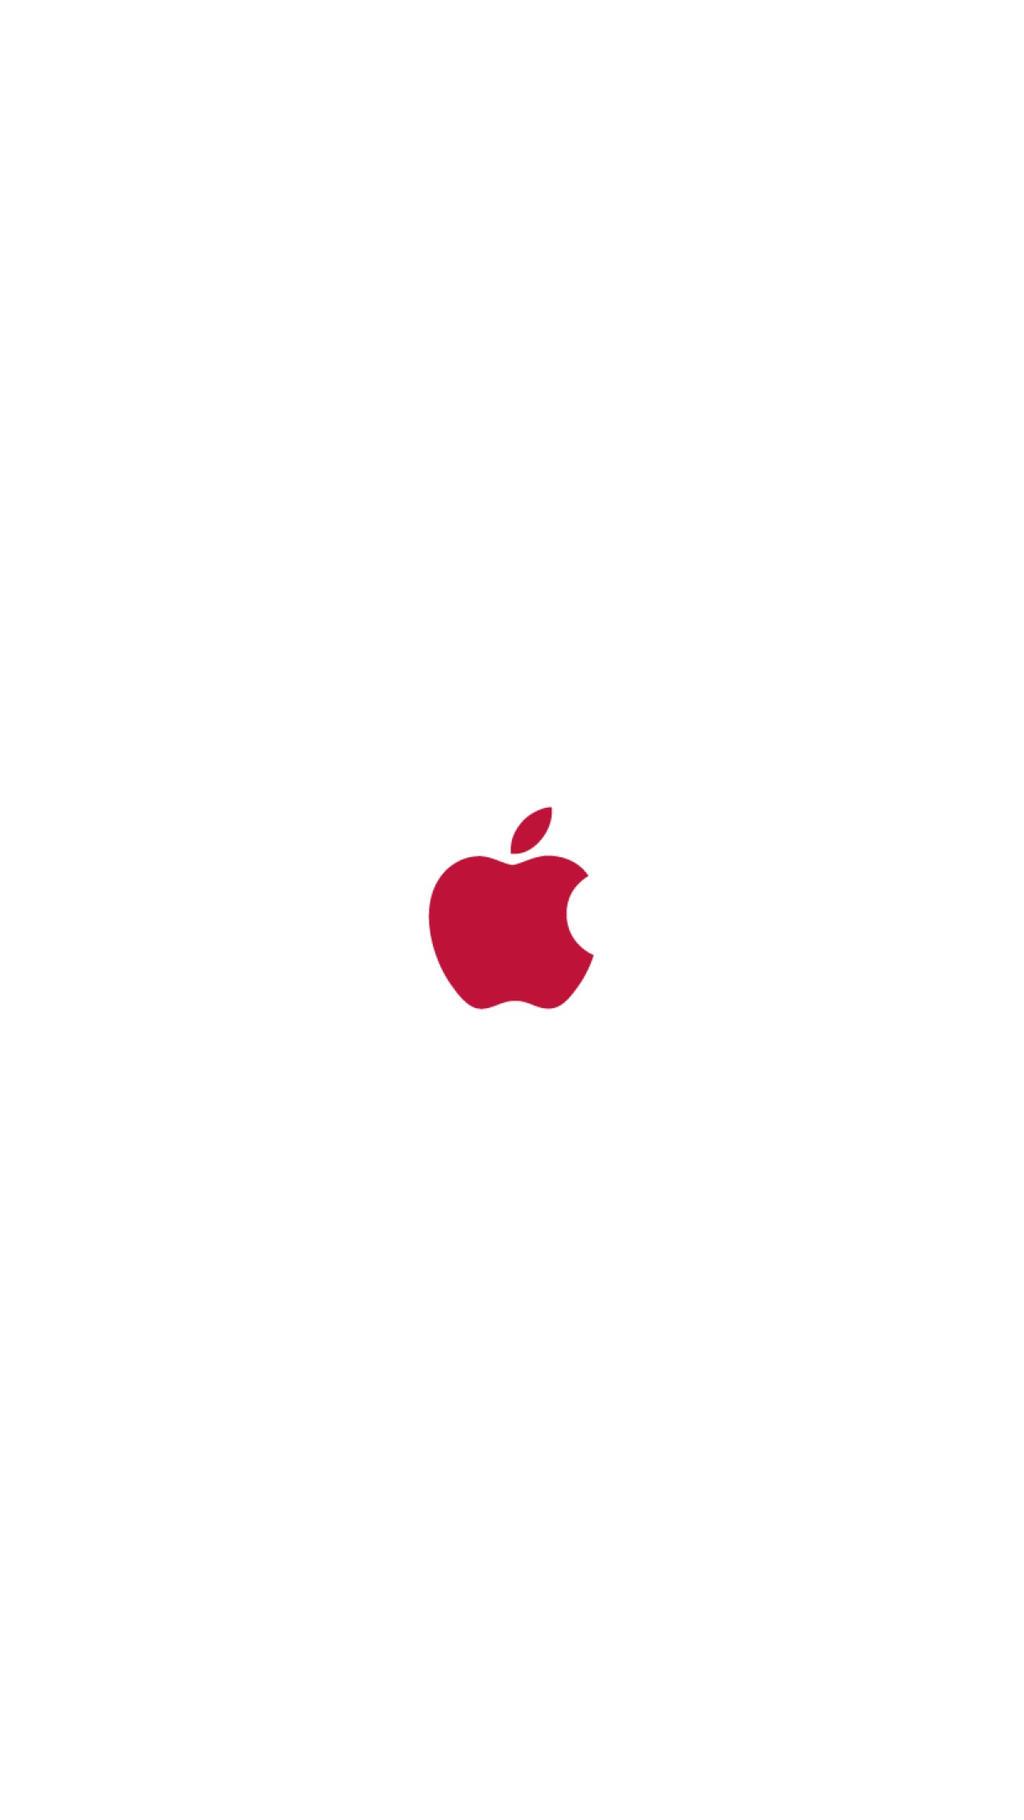 apple (red) wallpapergvc123 on deviantart